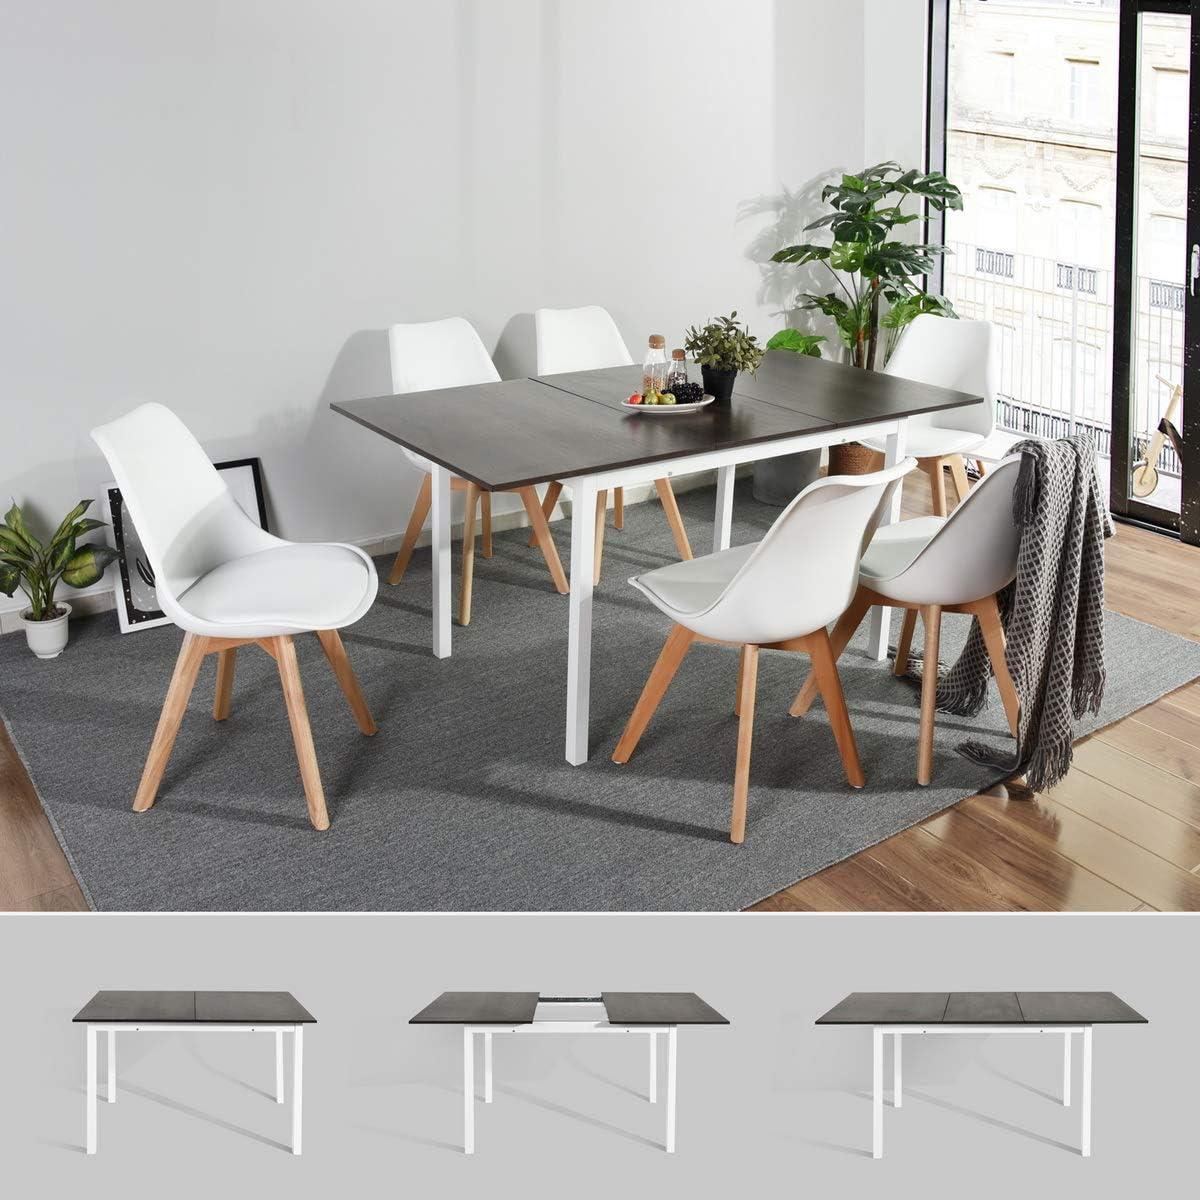 Extendable Dining Table, HOMEMAKE Amazing Large Multipurpose Kitchen Home  Restaurant Table 11-11CM